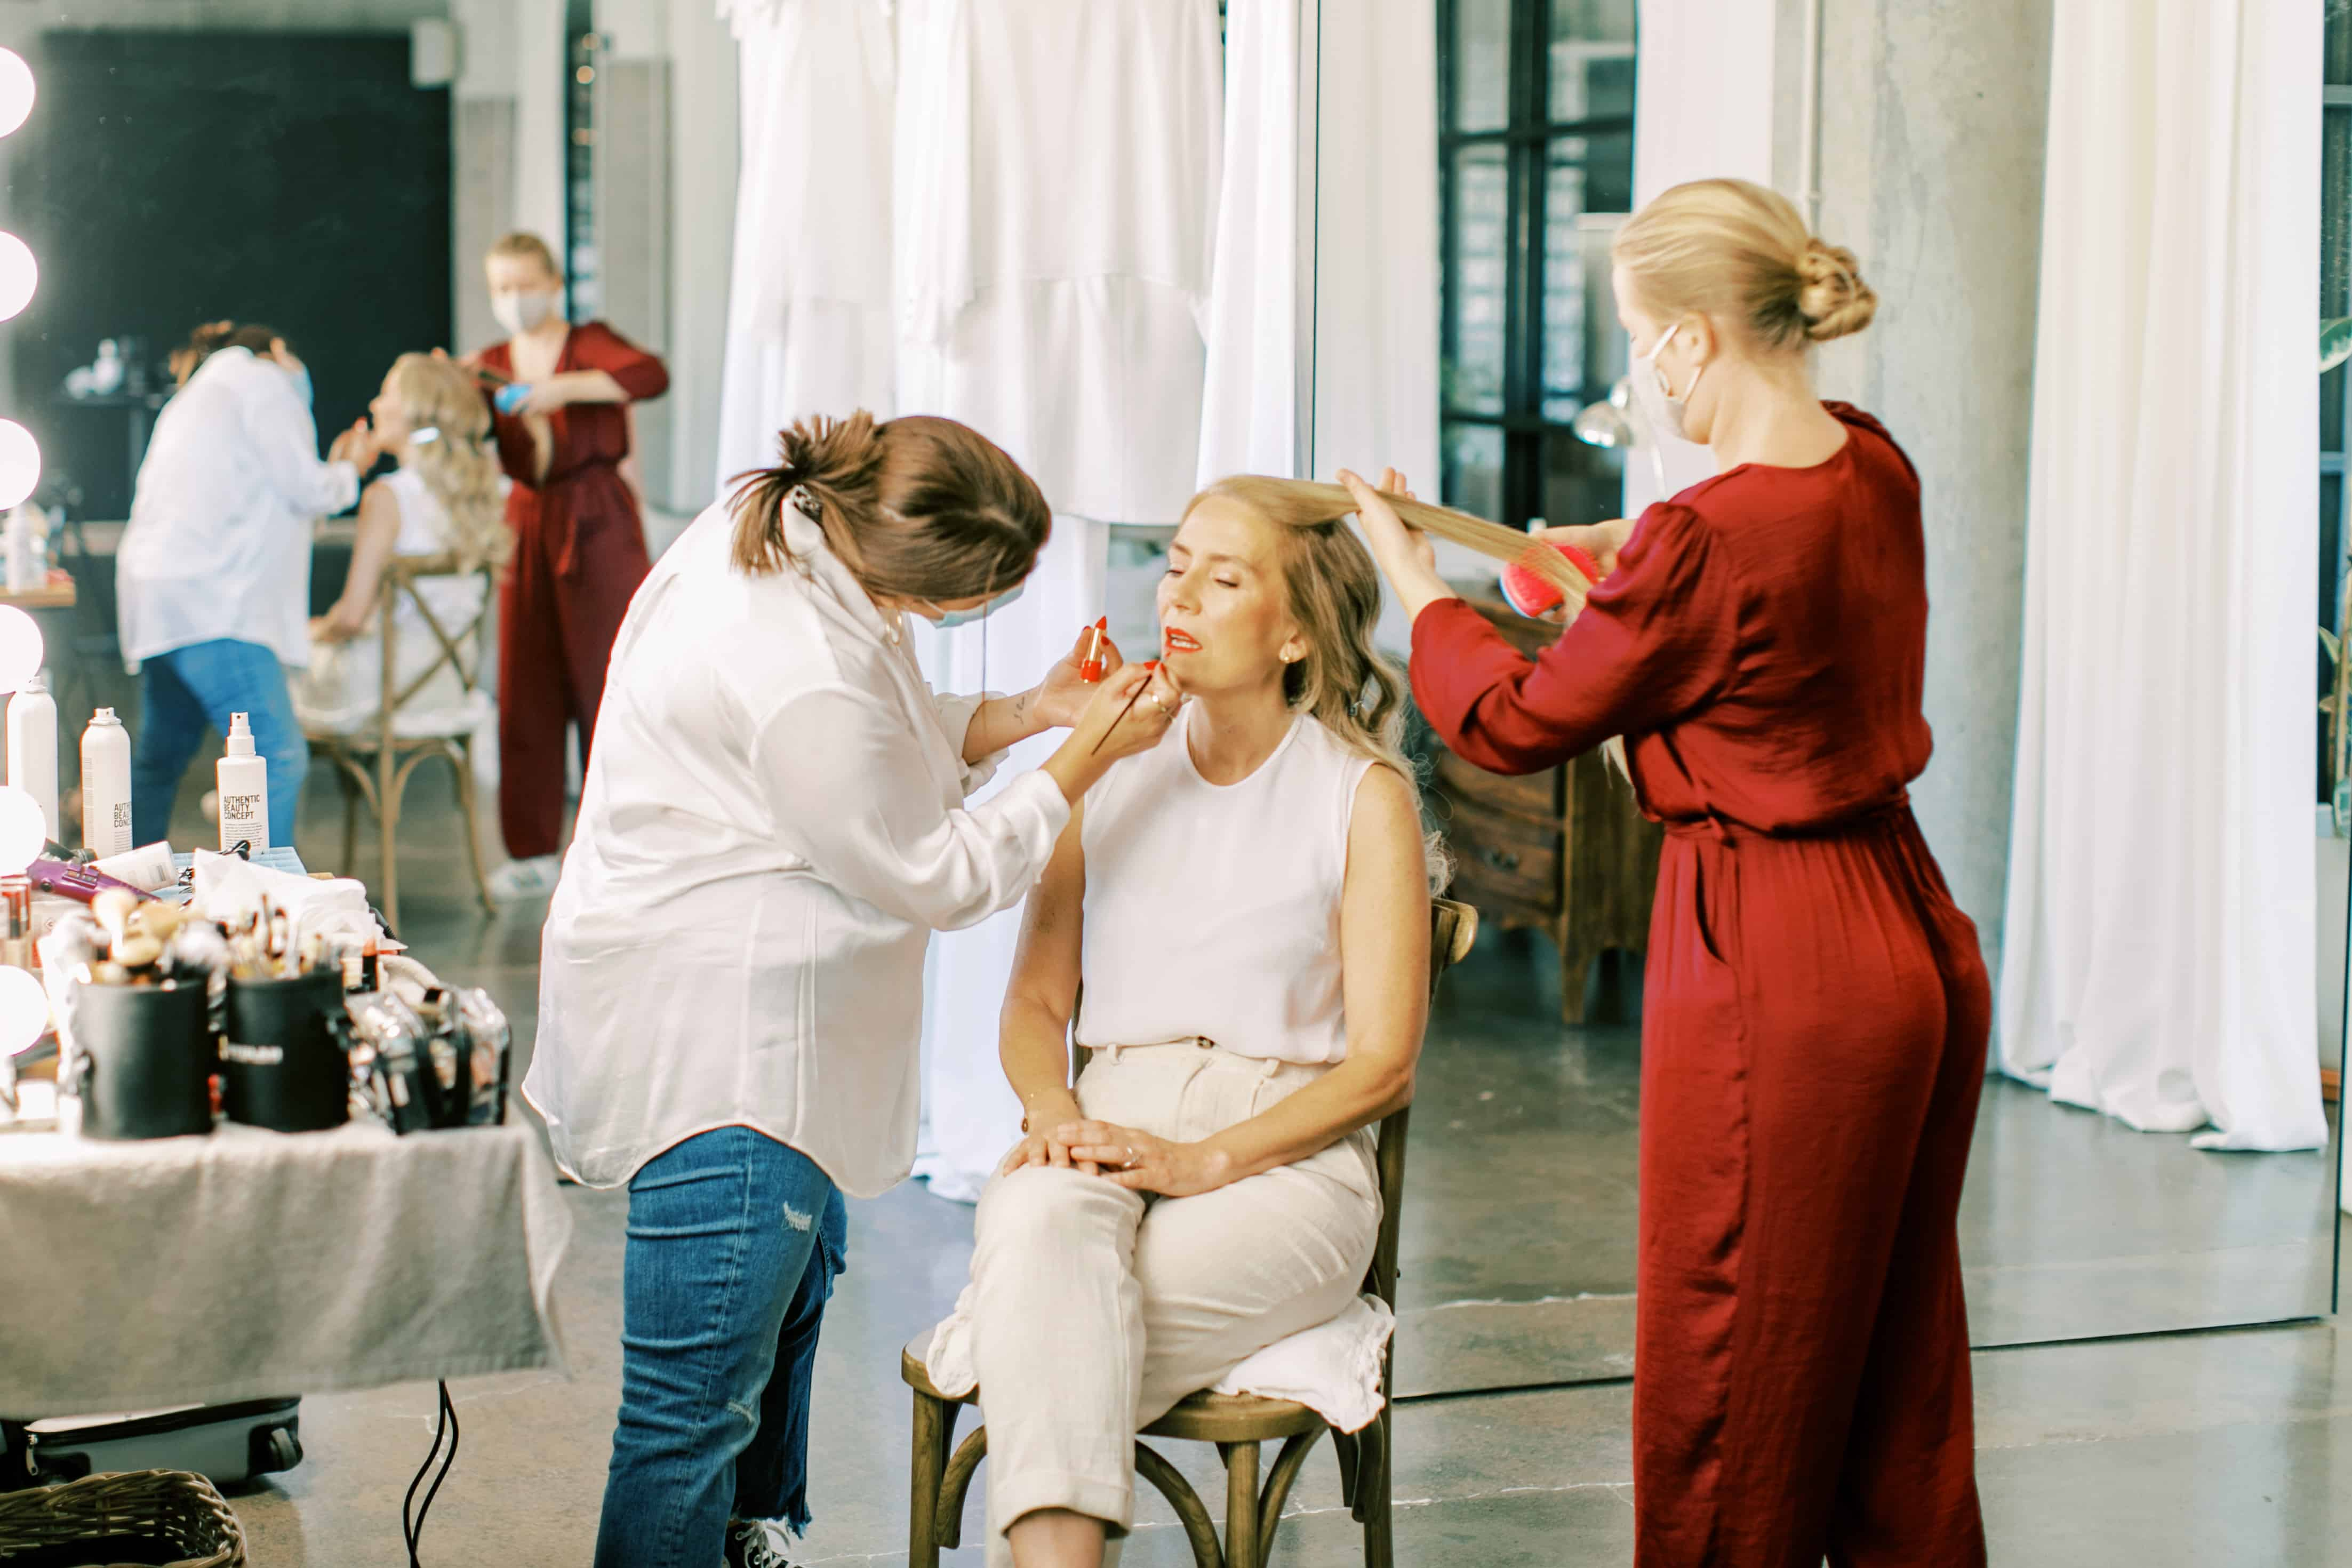 Wedding beauty team in Portugal: makeup artist Rita Santos Tecas and hairstylist letshair